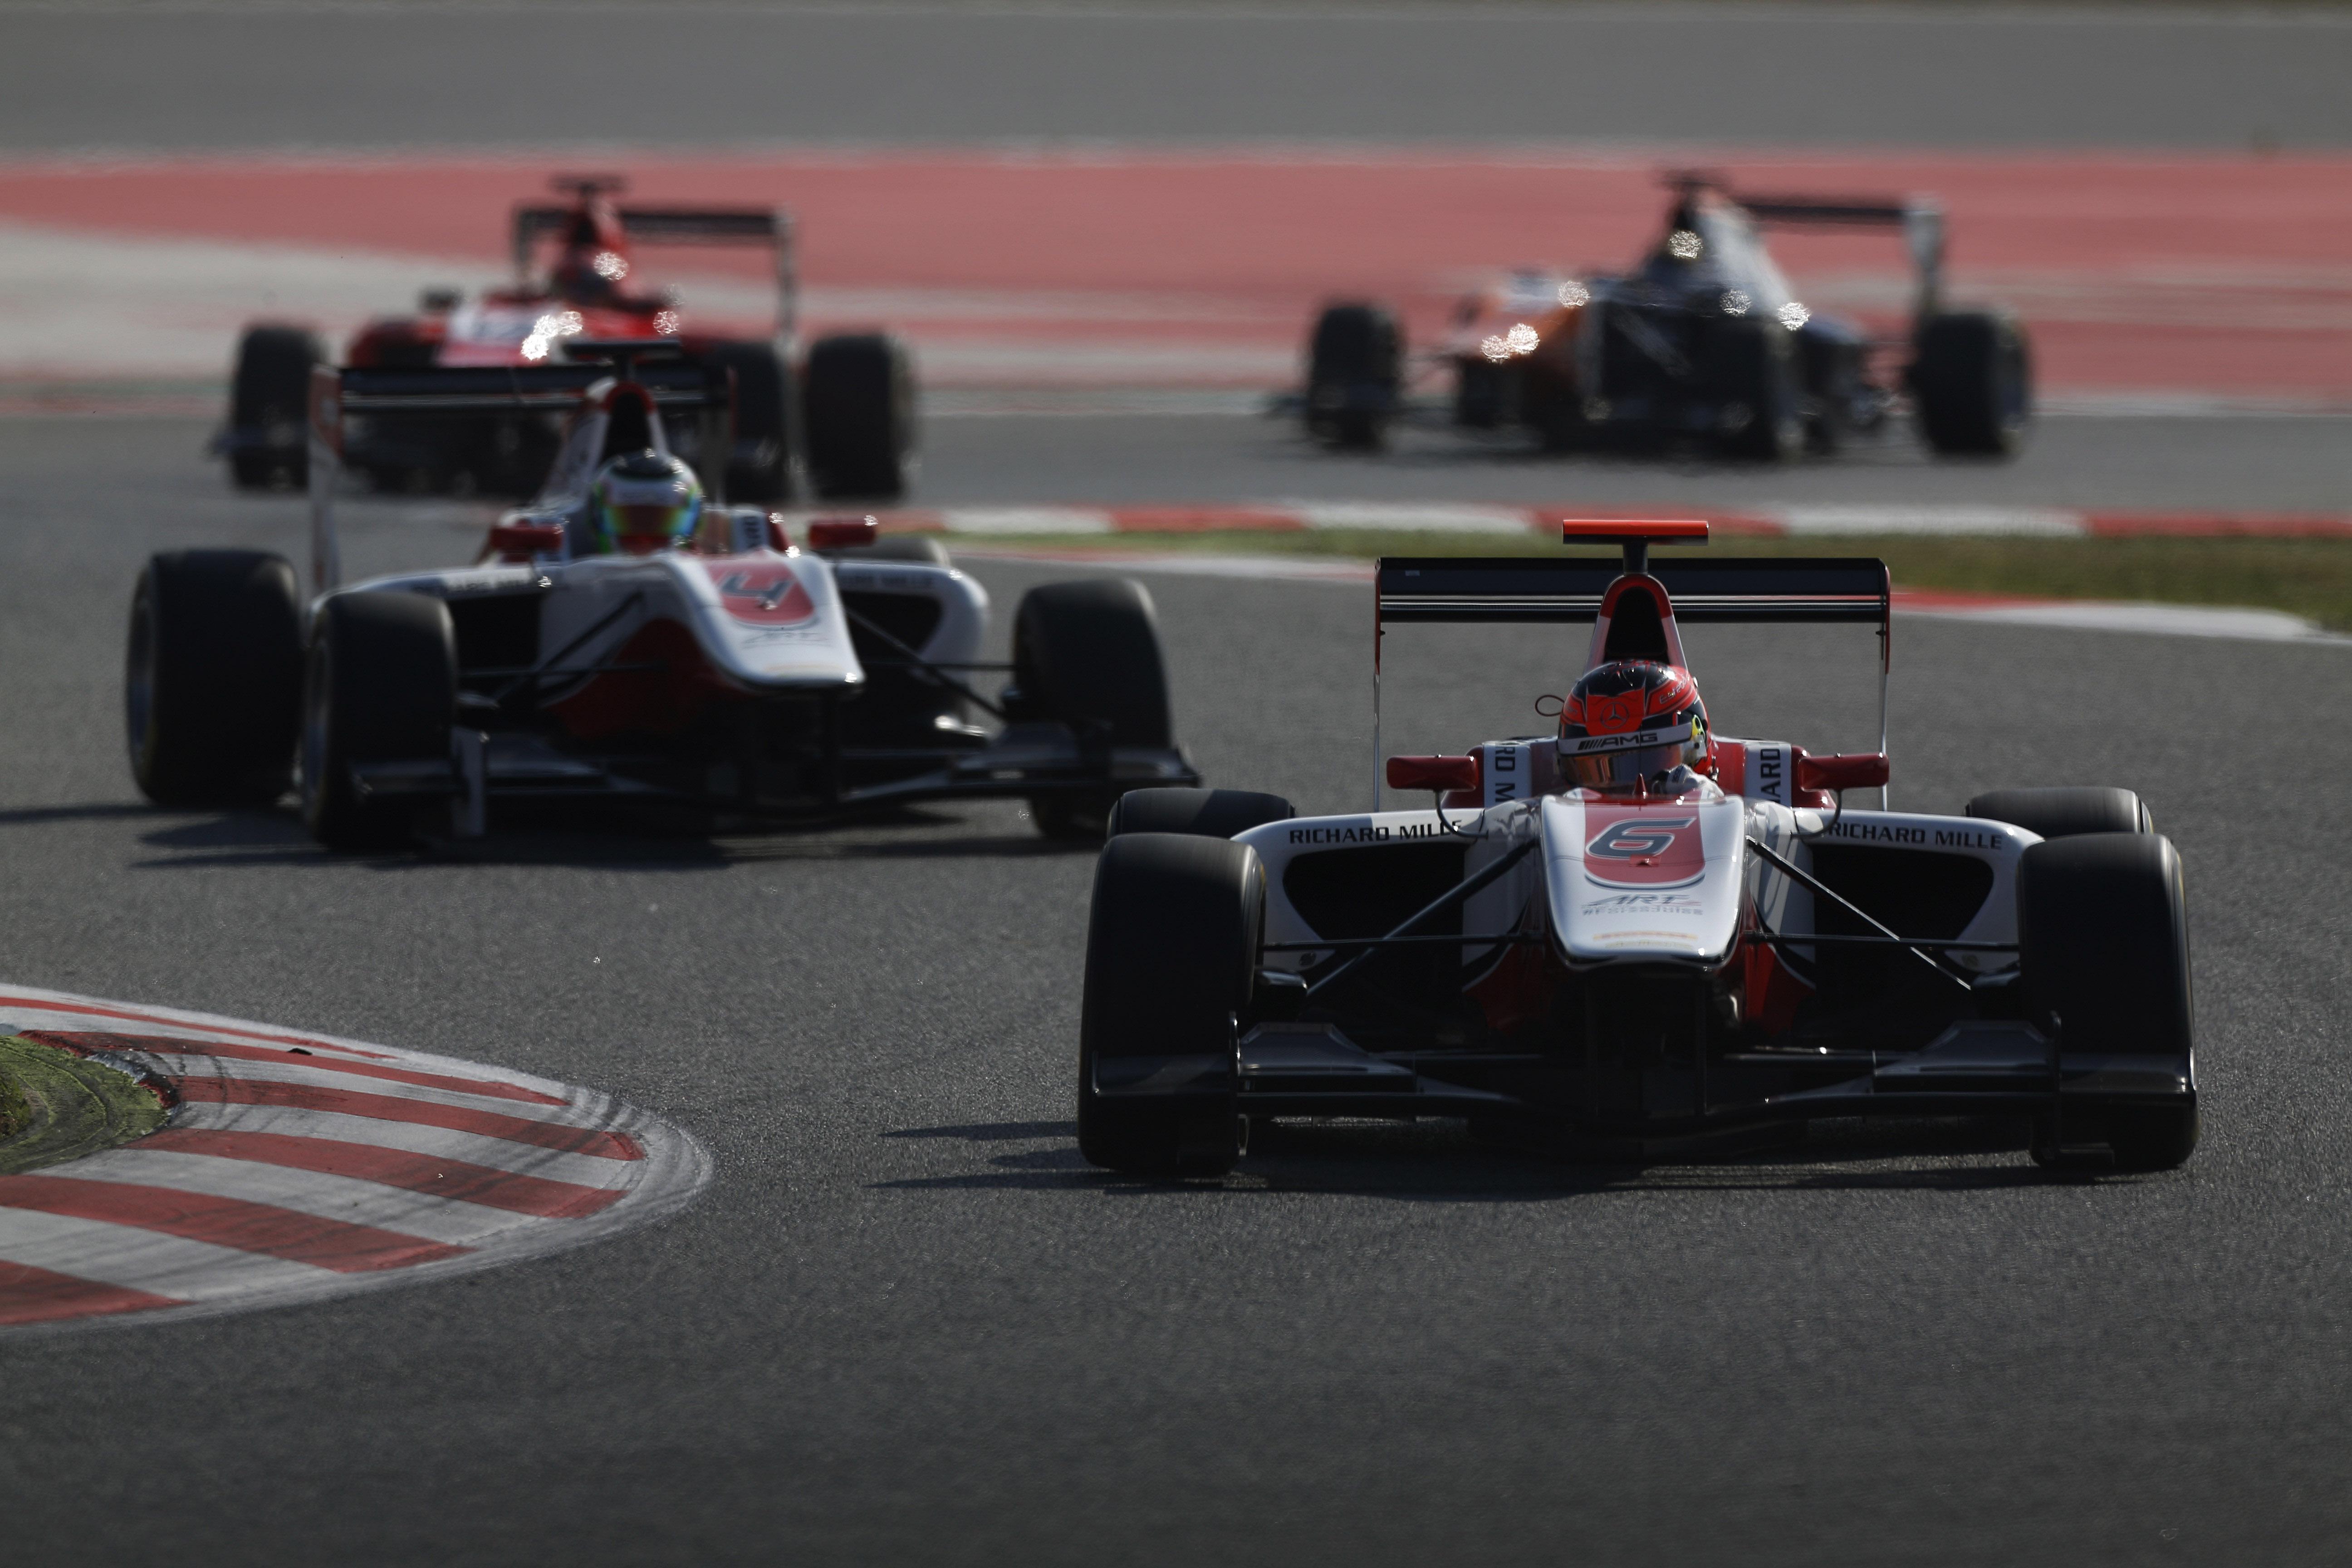 Esteban Ocon GP3 Barcelona 2015